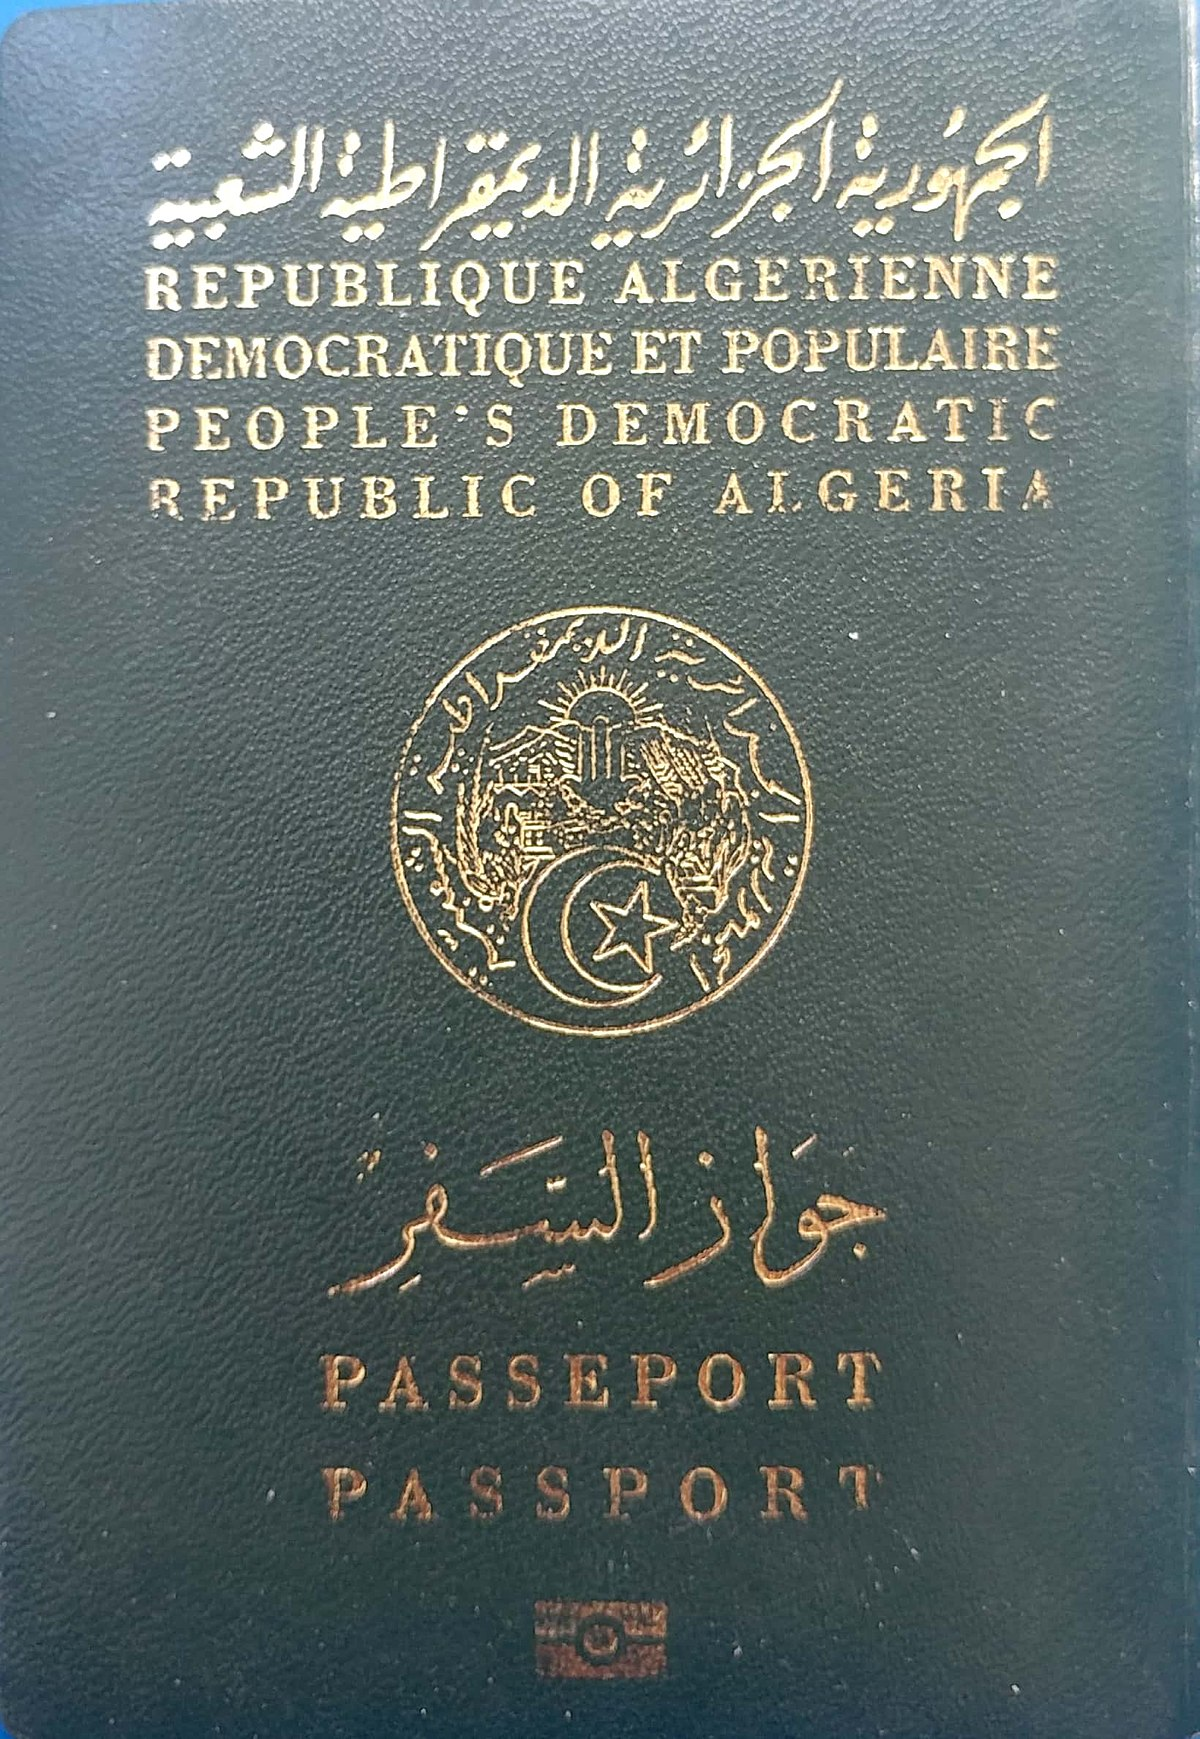 Visa requirements for Algerian citizens - Wikipedia